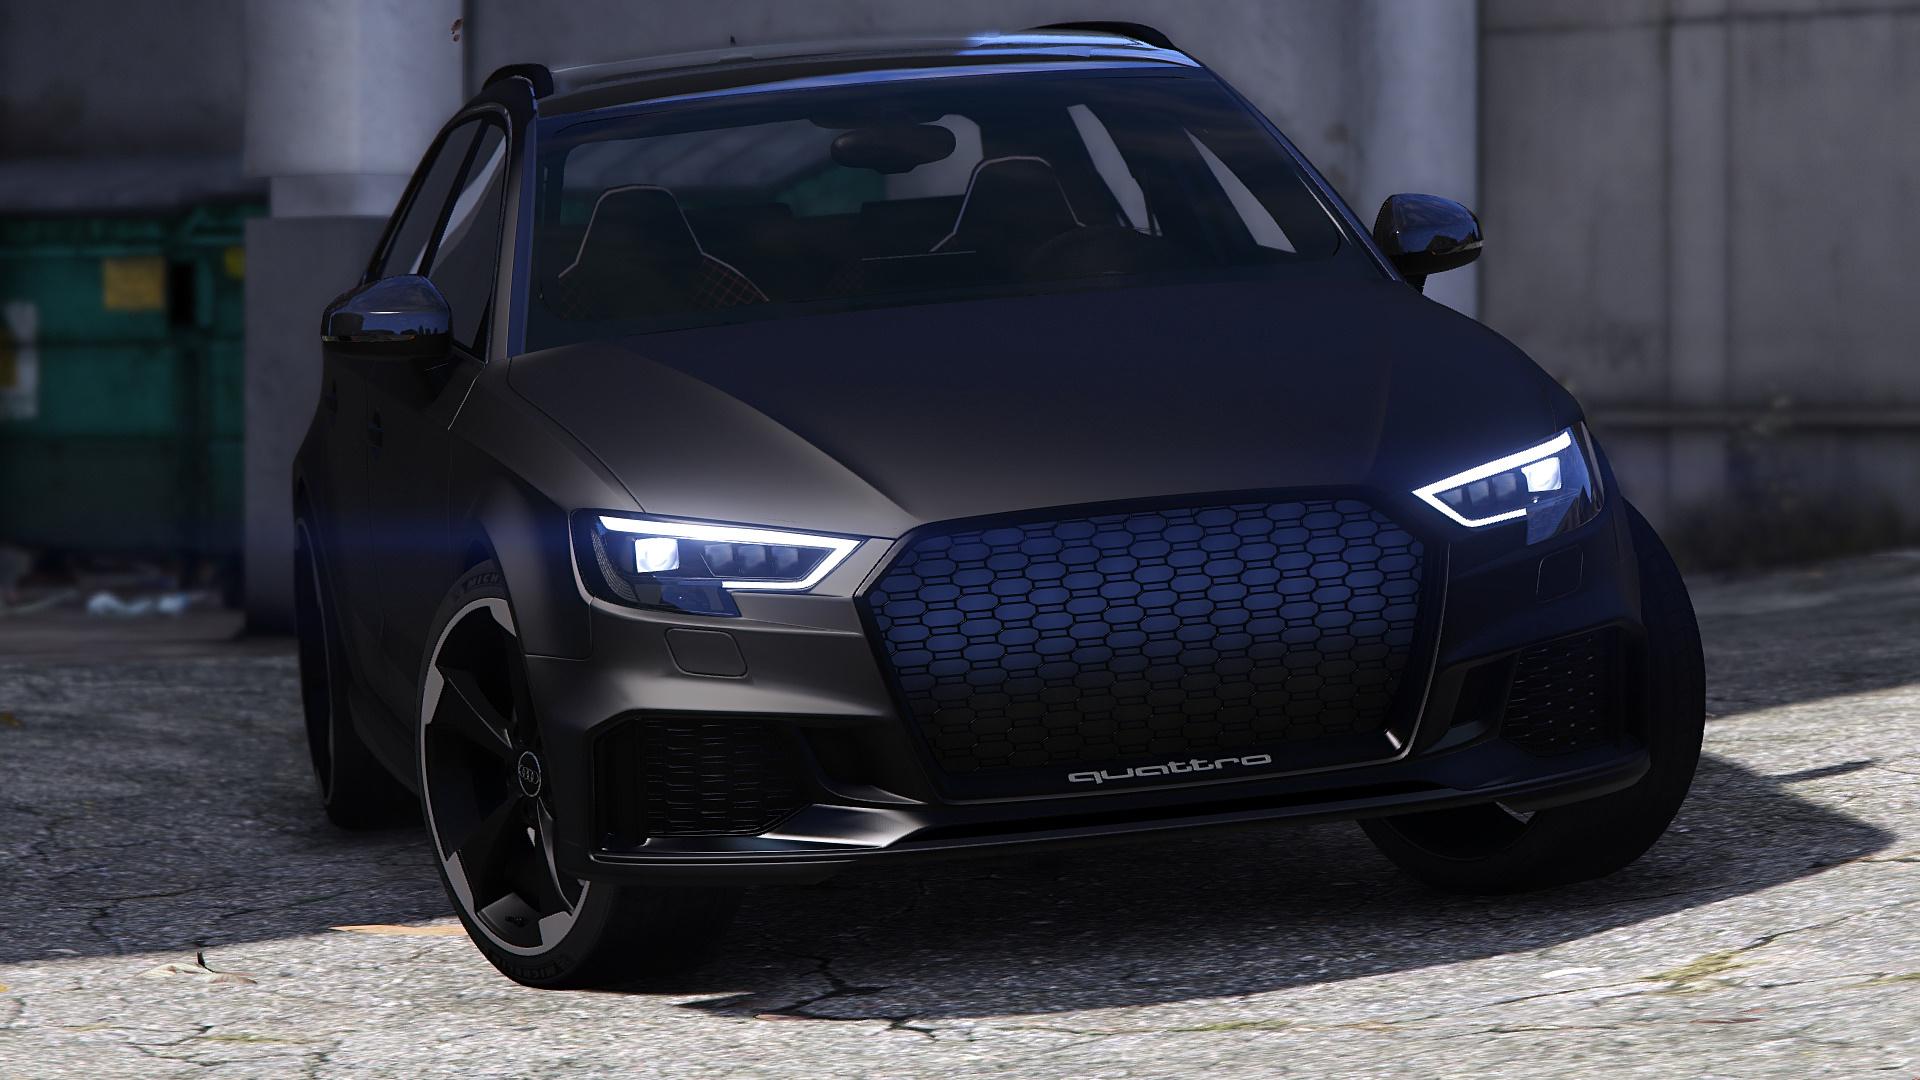 Audi Rs3 Wallpaper Hd Audi Rs3 Sportback 2018 Add On Tuning Abt Gta5 Mods Com